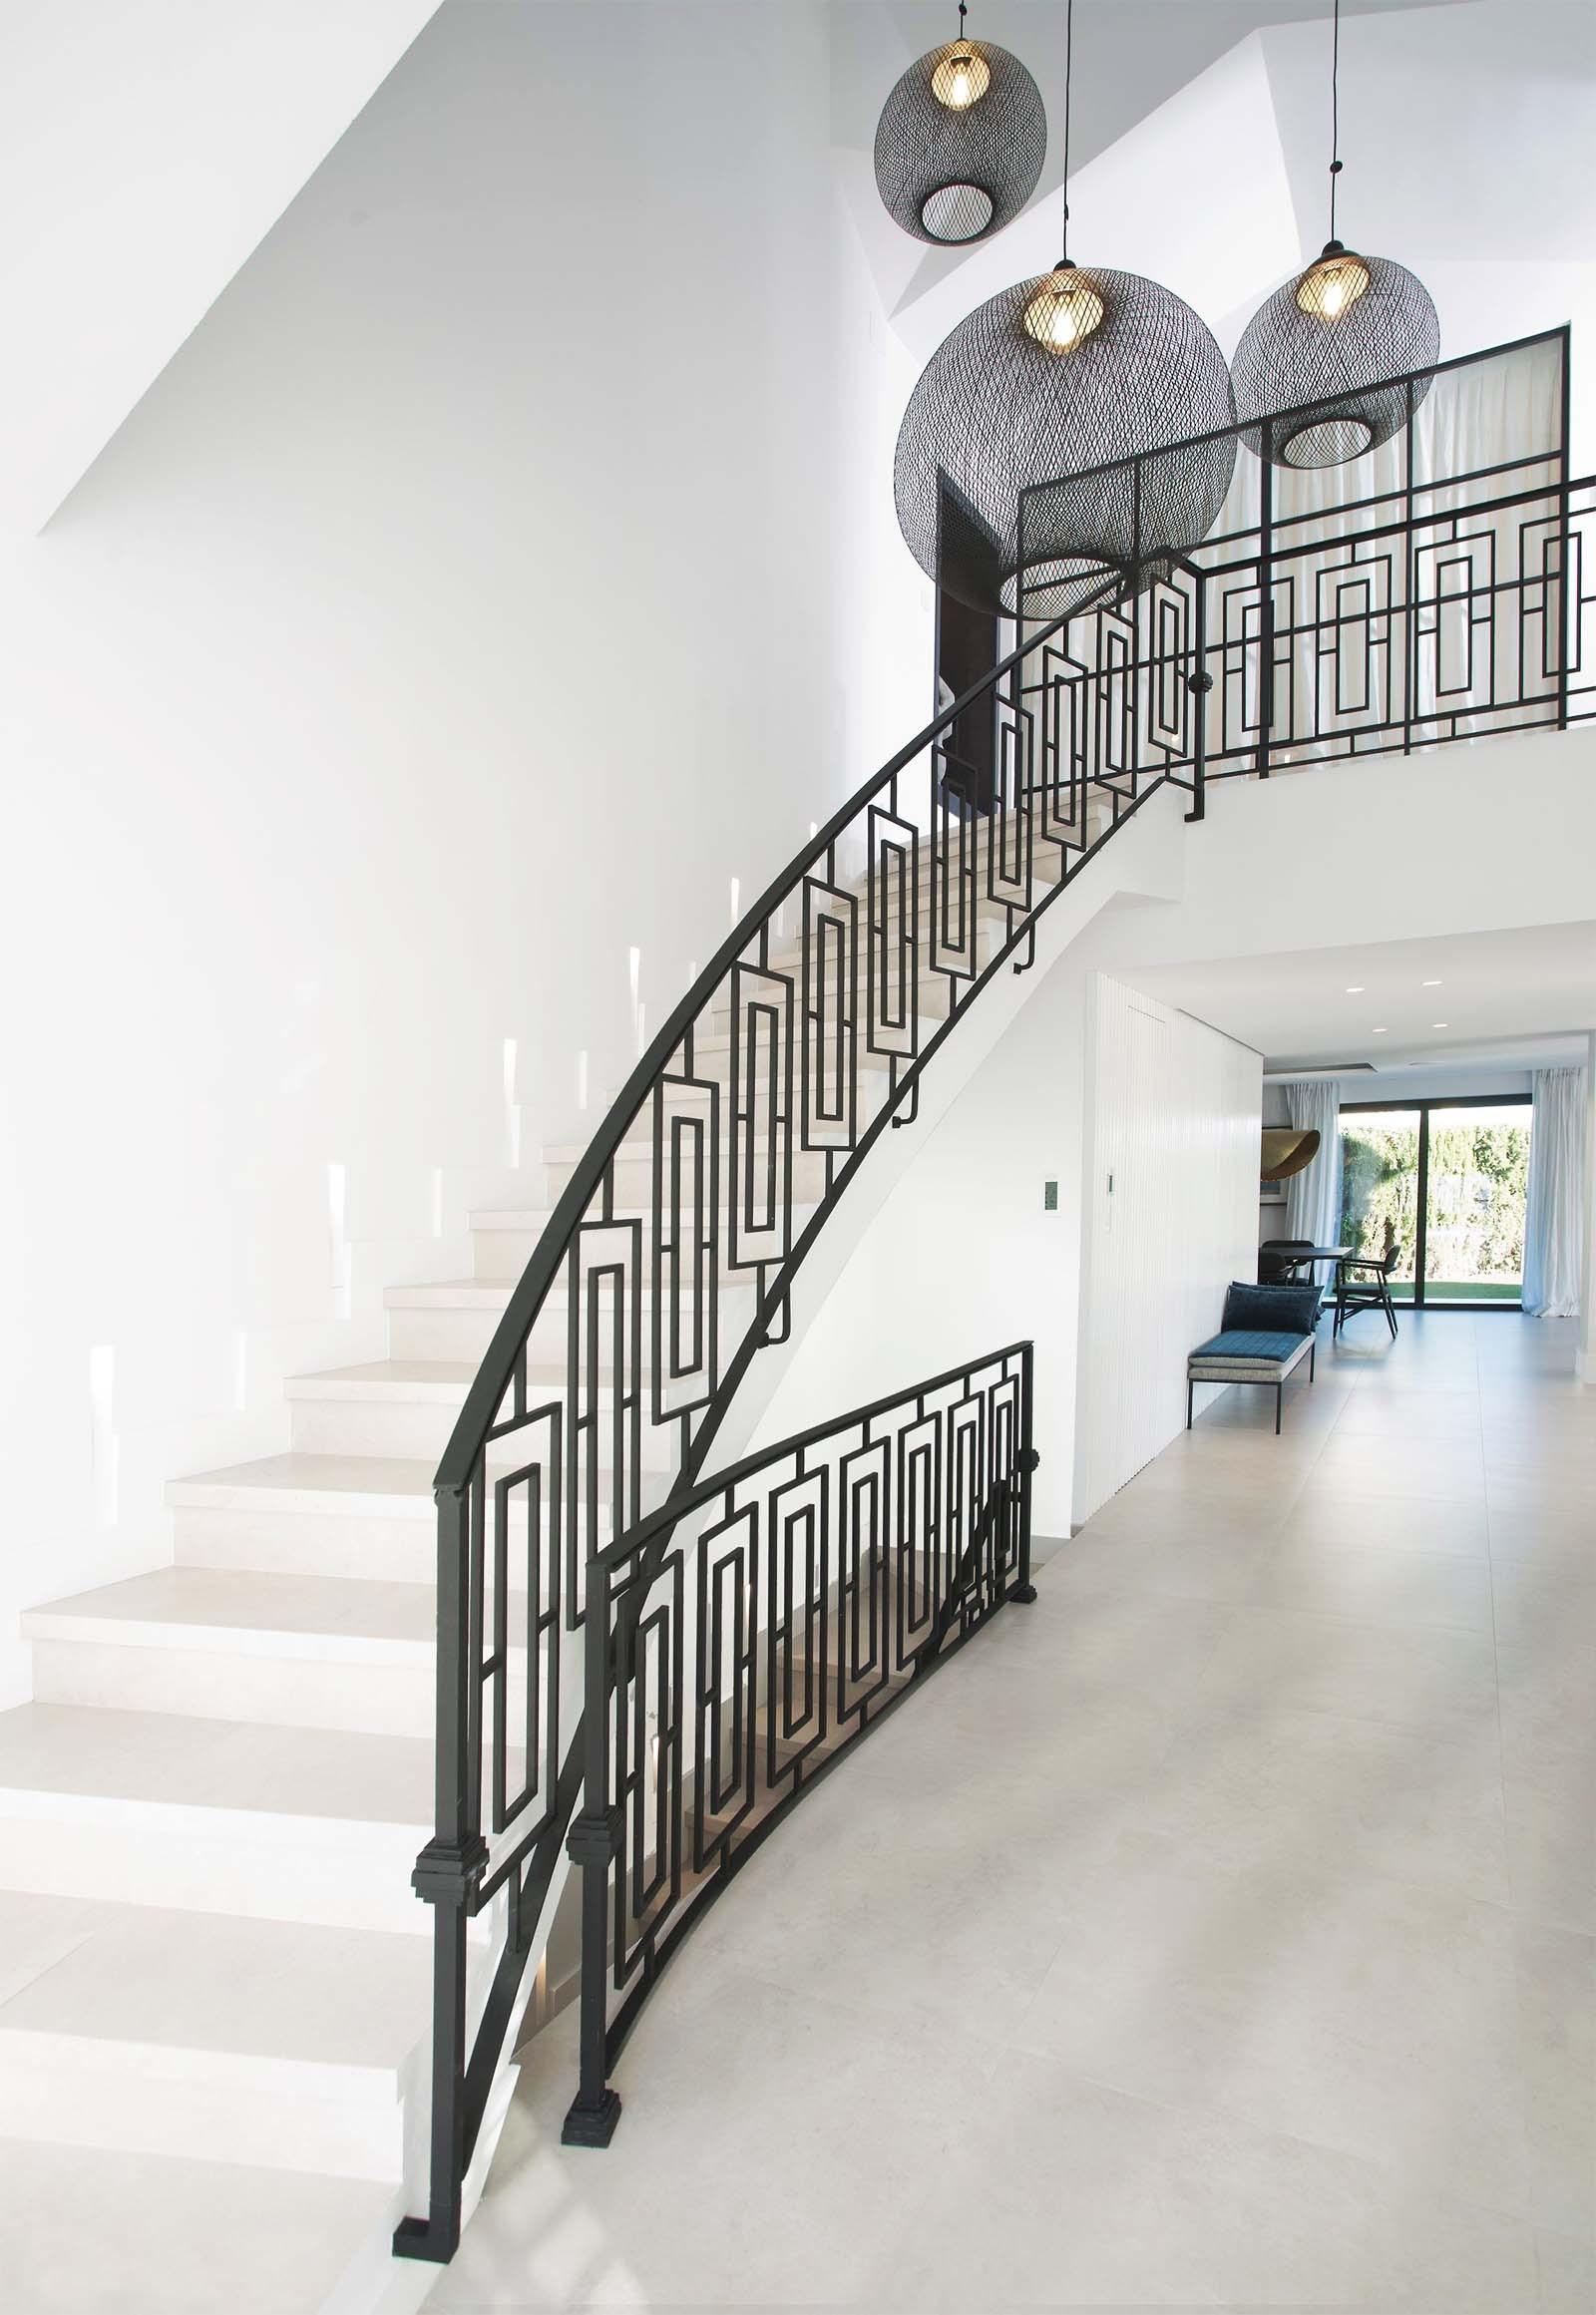 Modern Staircase Design Contemporary Stair Design Ideas | Modern Stair Rails Indoor | Beautiful | Unique Fancy Stair | Wooden | Industrial | Flat Bar